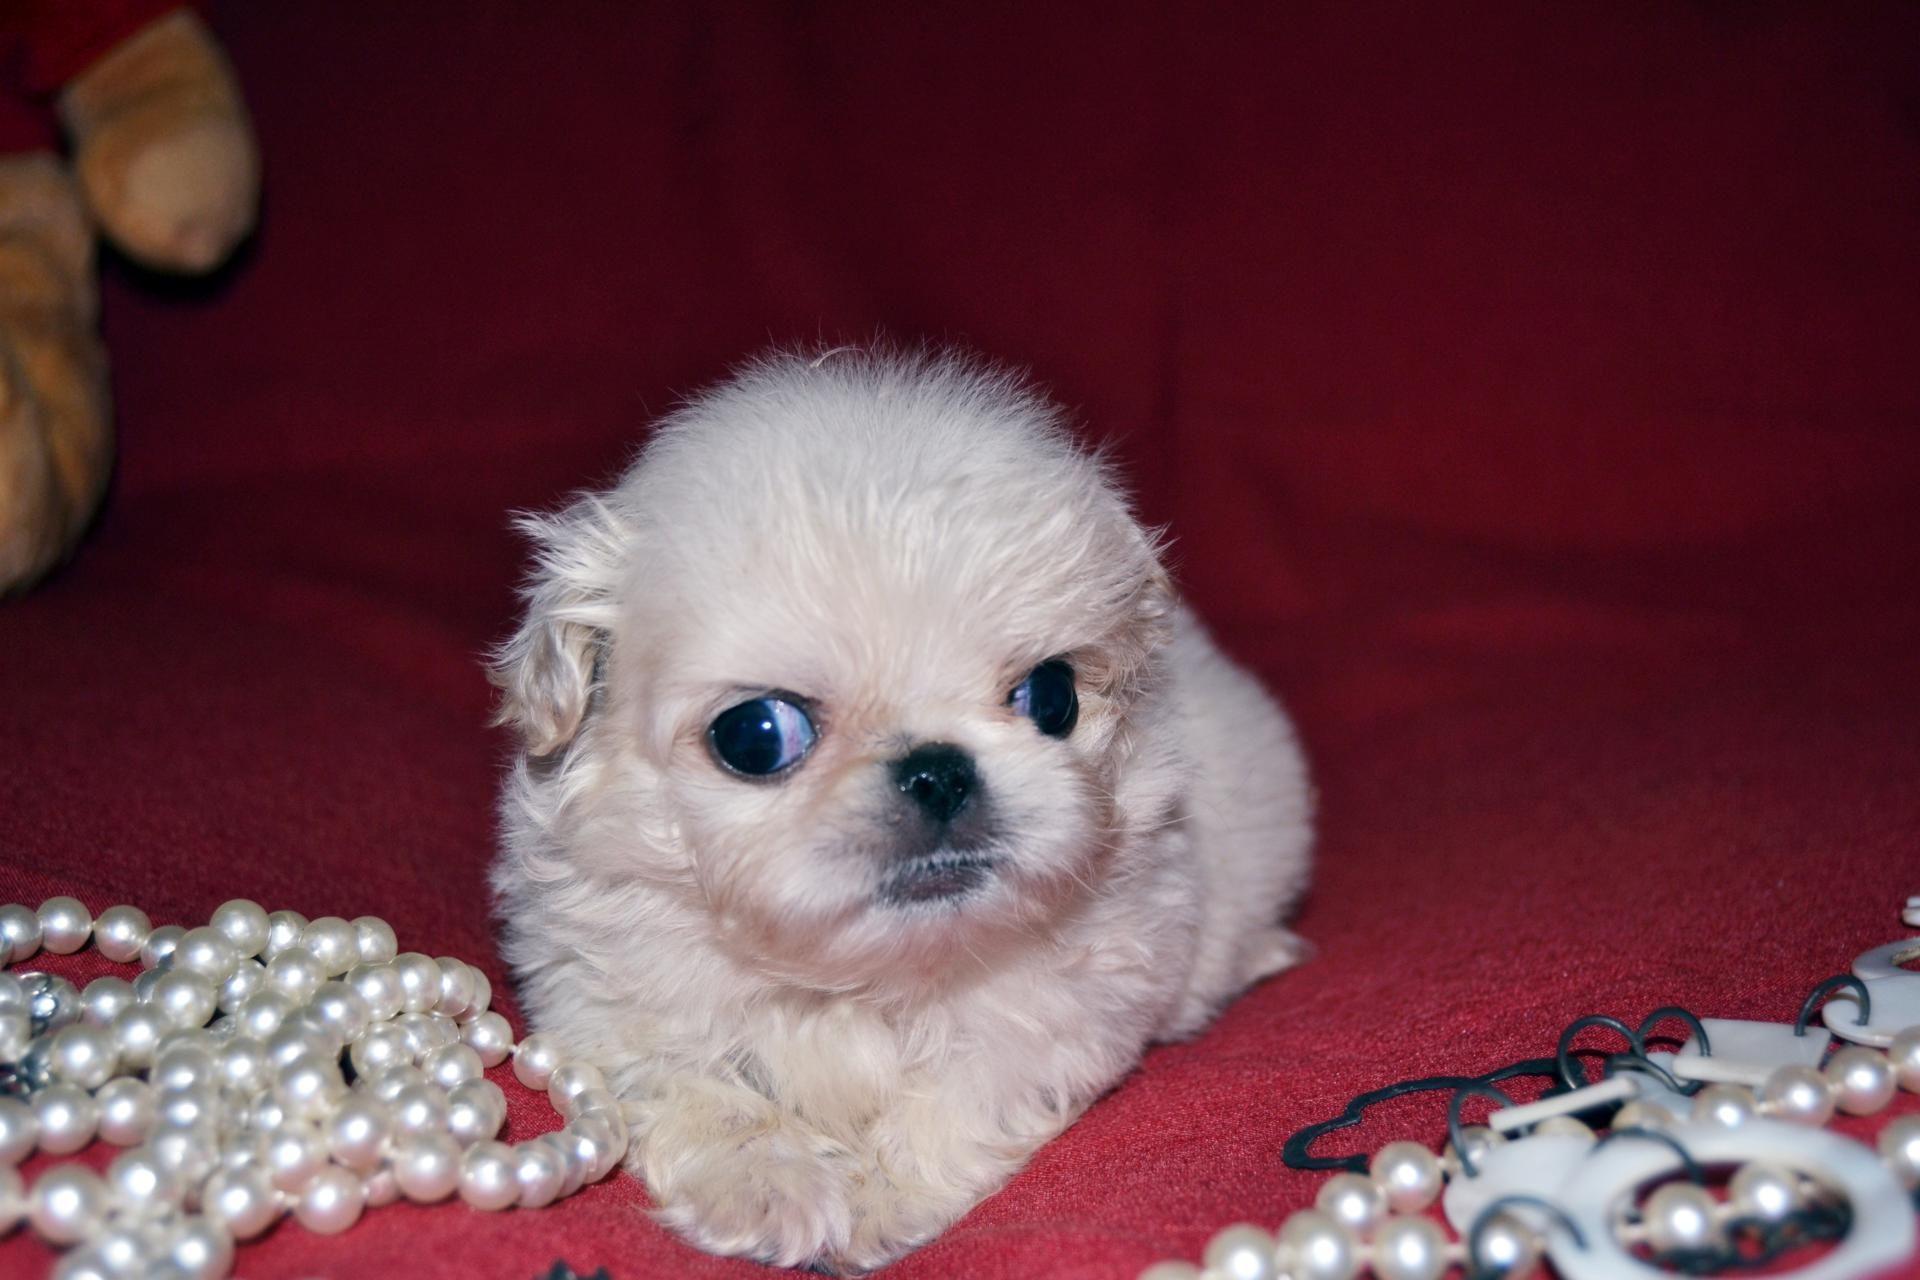 Big eyes de gallumar pekingese puppies